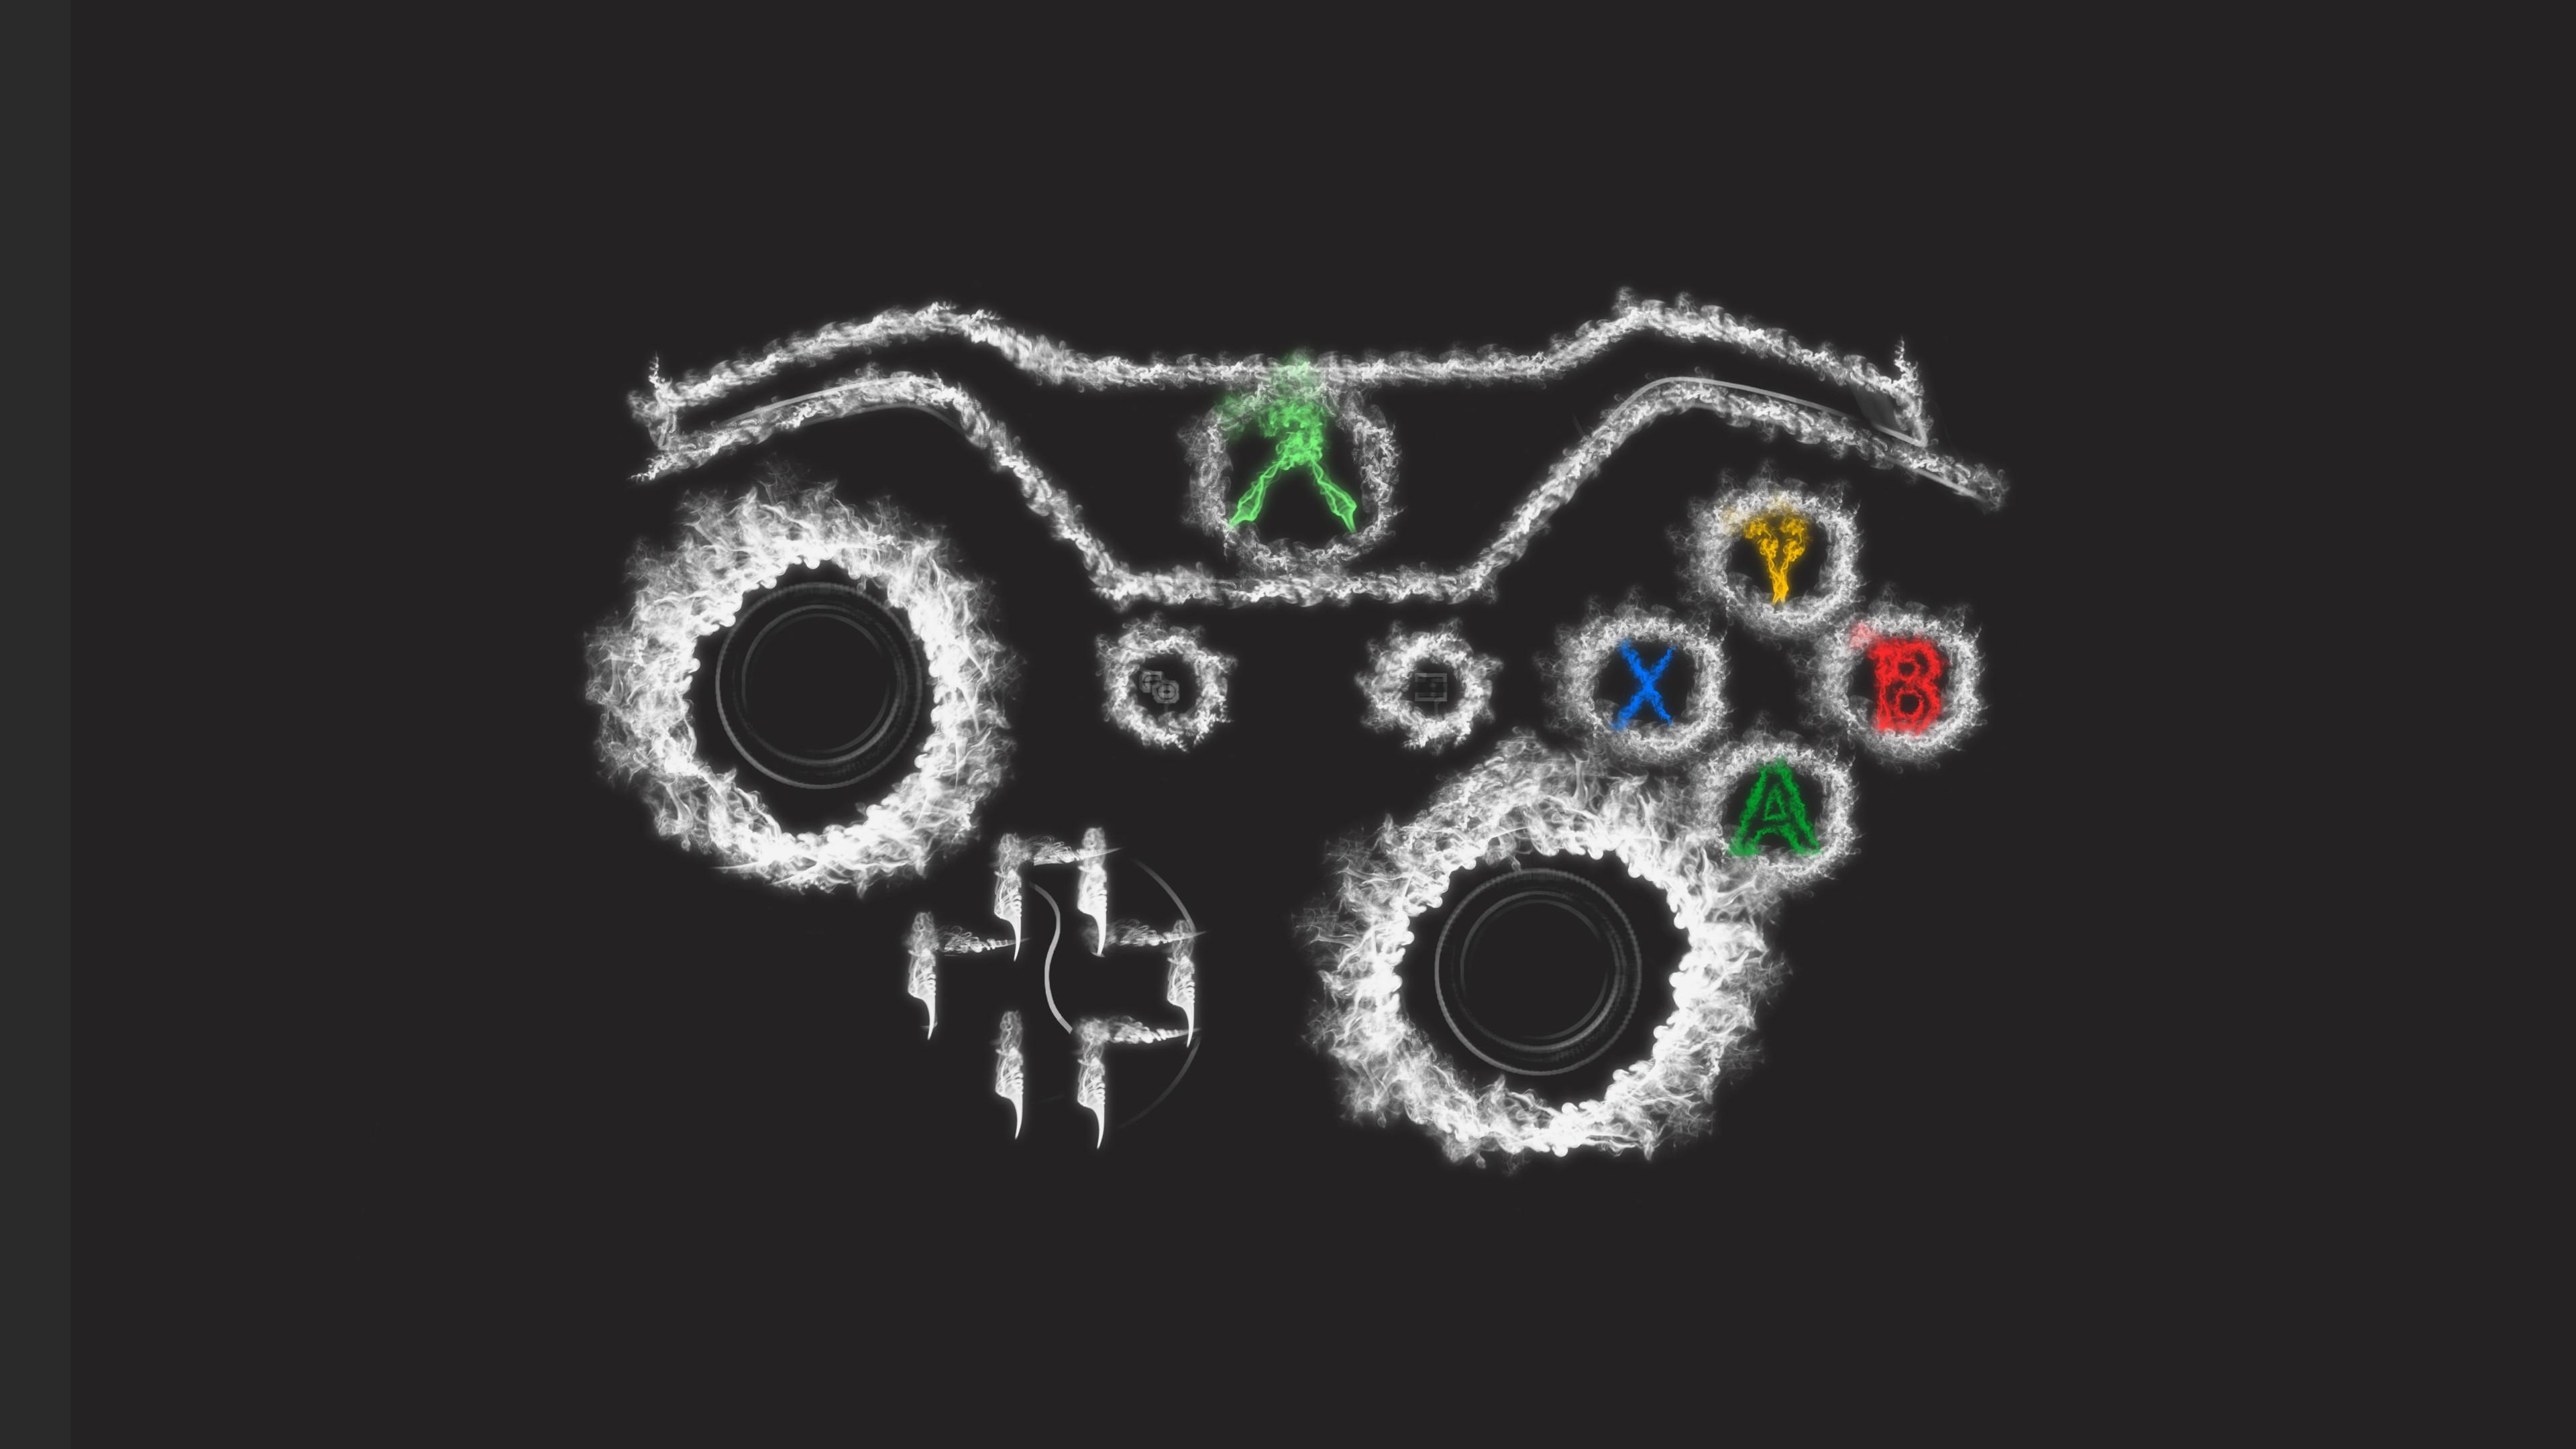 Xbox Wallpaper 13